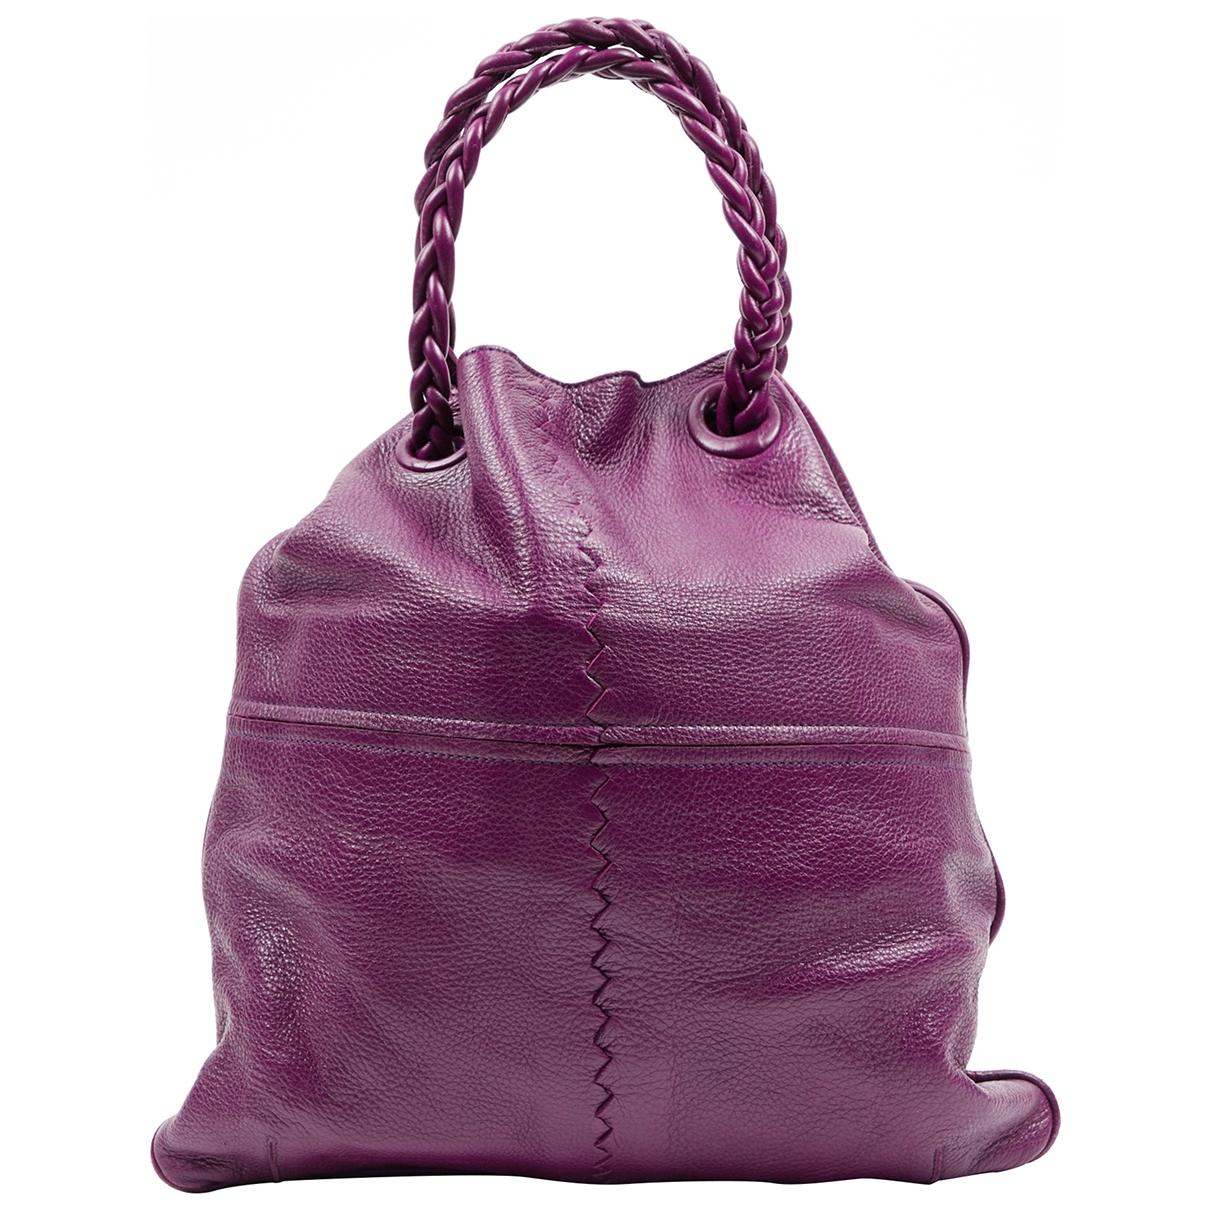 Bottega Veneta - Sac a main Arco pour femme en cuir - violet